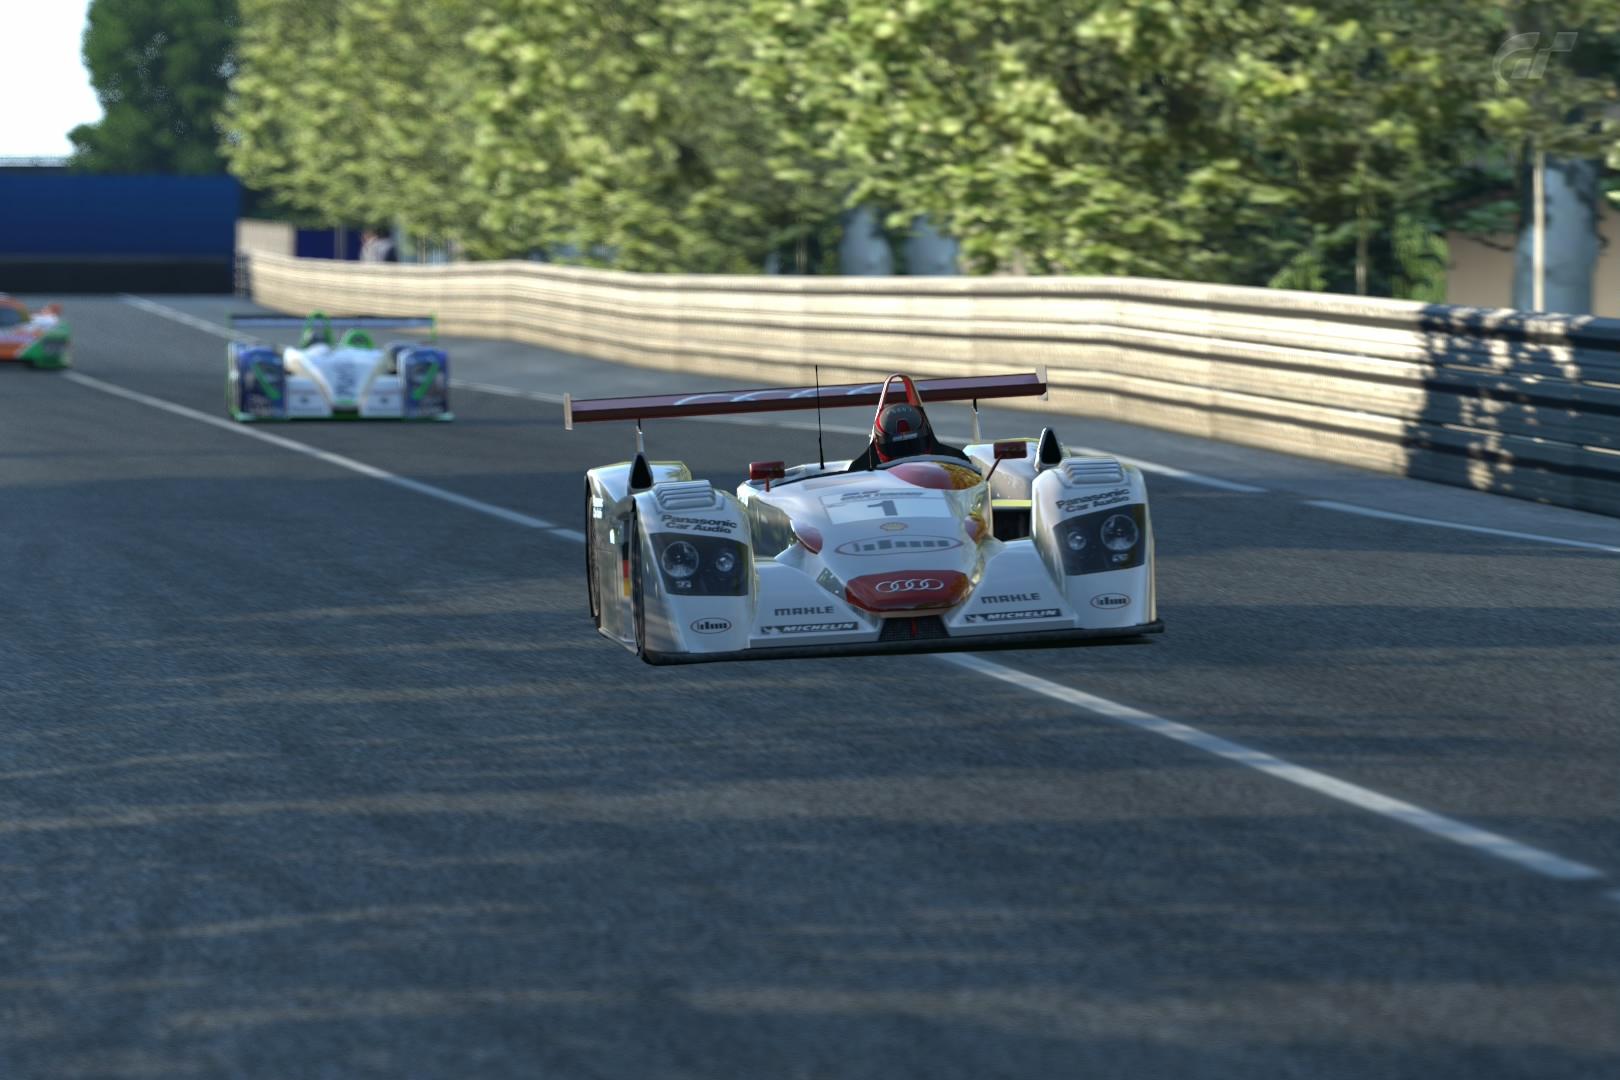 Audi R Race Car Gran Turismo Wiki FANDOM Powered By Wikia - Audi r8 race car 01 gt6